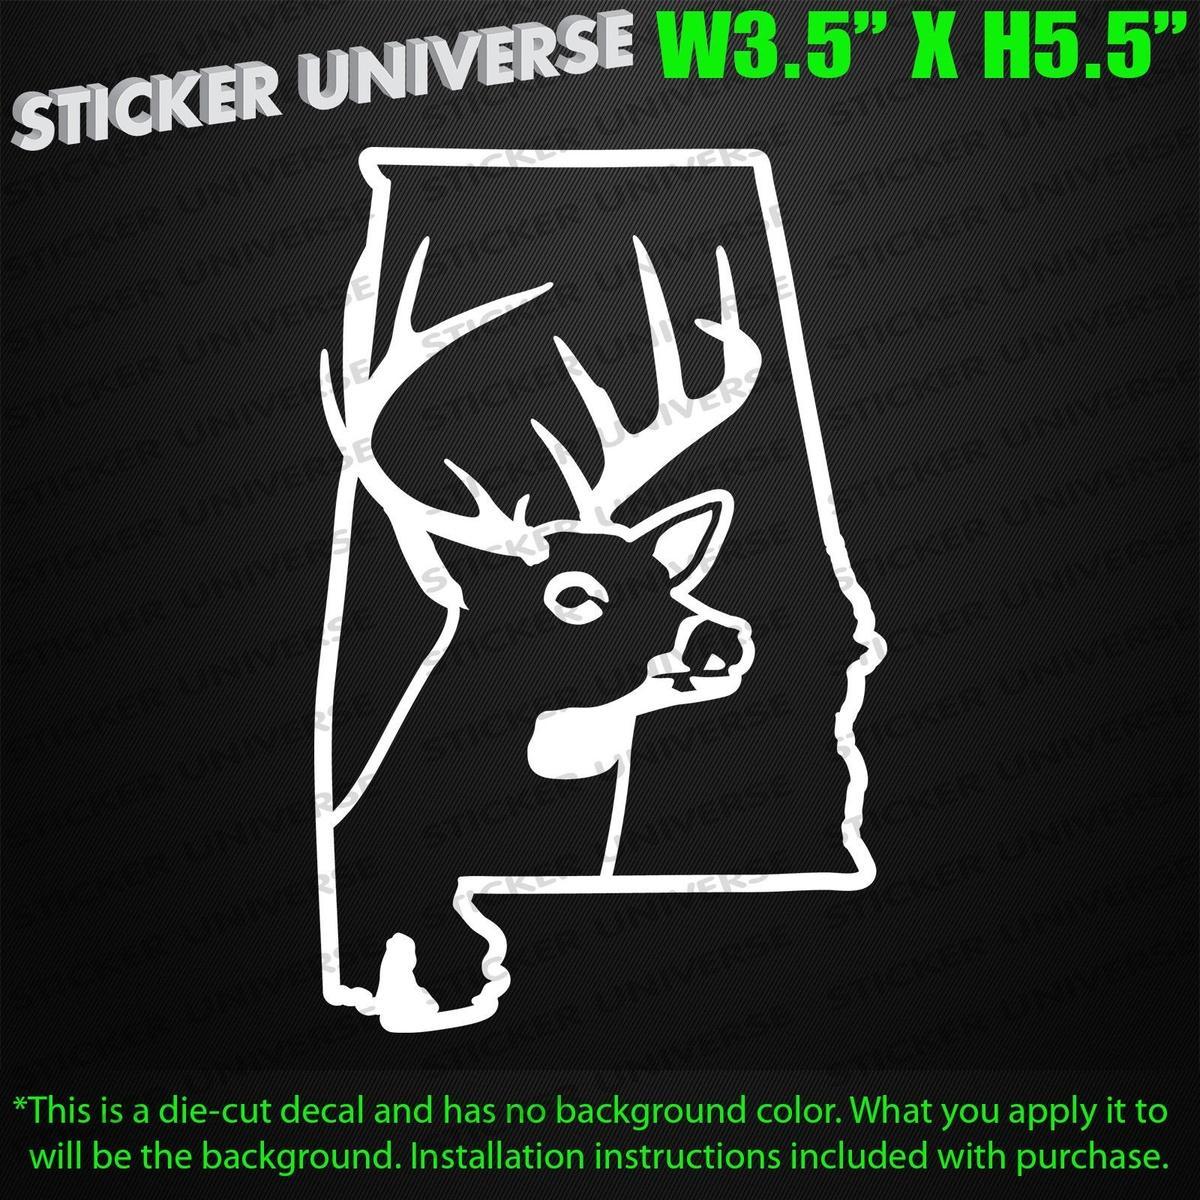 Car styling for alabama deer head die cut decal bumper sticker 3 5x5 5 bow hunting buck antler